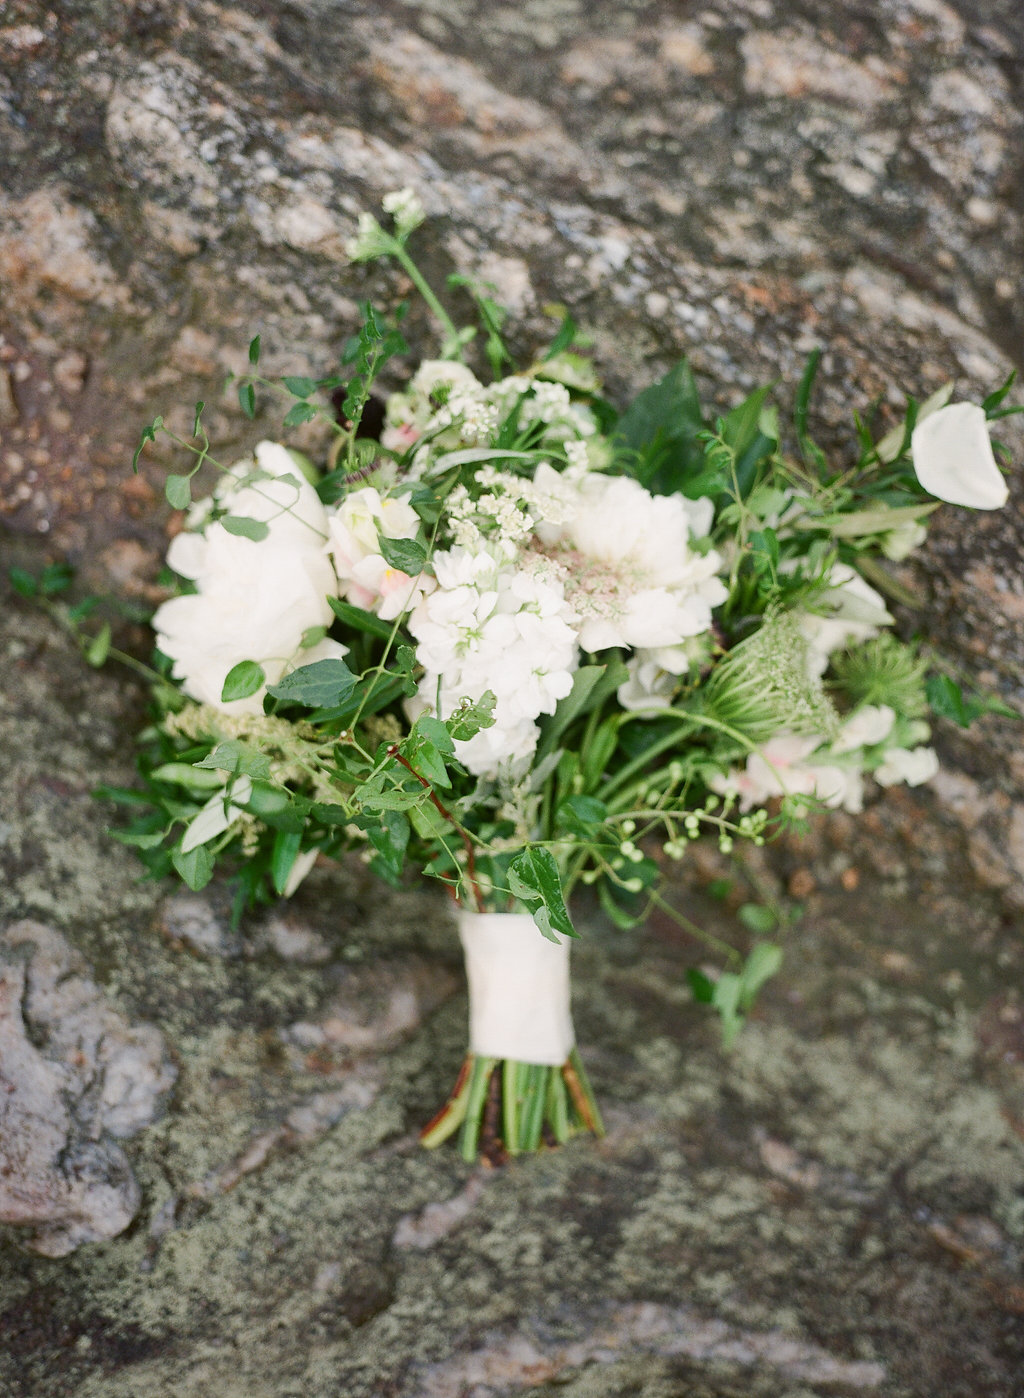 josie-photographs-urban-petals-mountain-wedding-north-carolina-mountain-wedding-ivory-and-beau-bridal-boutique-savannah-wedding-dresses-savannah-bridal-boutique-savannah-wedding-gowns-sarah-seven-lafayette-sarah-seven-wedding-dress-boho-bride-8.jpg